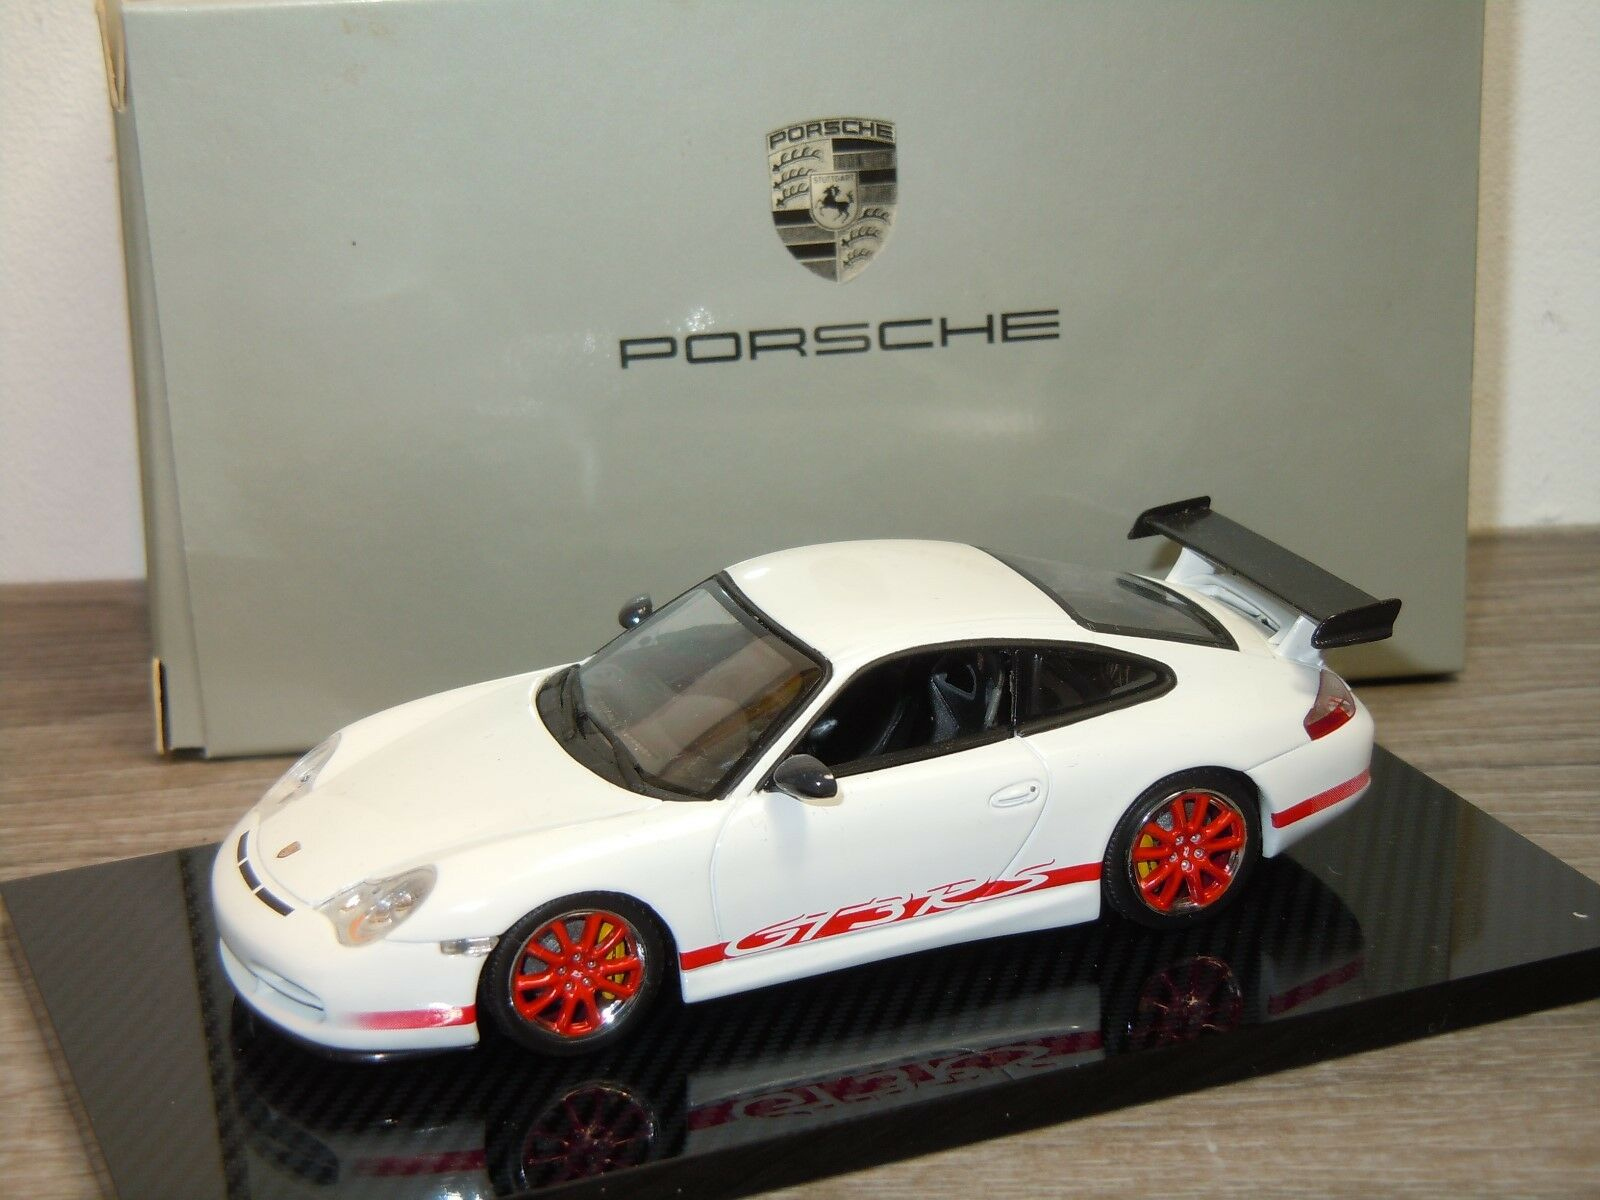 Porsche 911 996 GT3 RS - Minichamps 1 43 in Box 34070